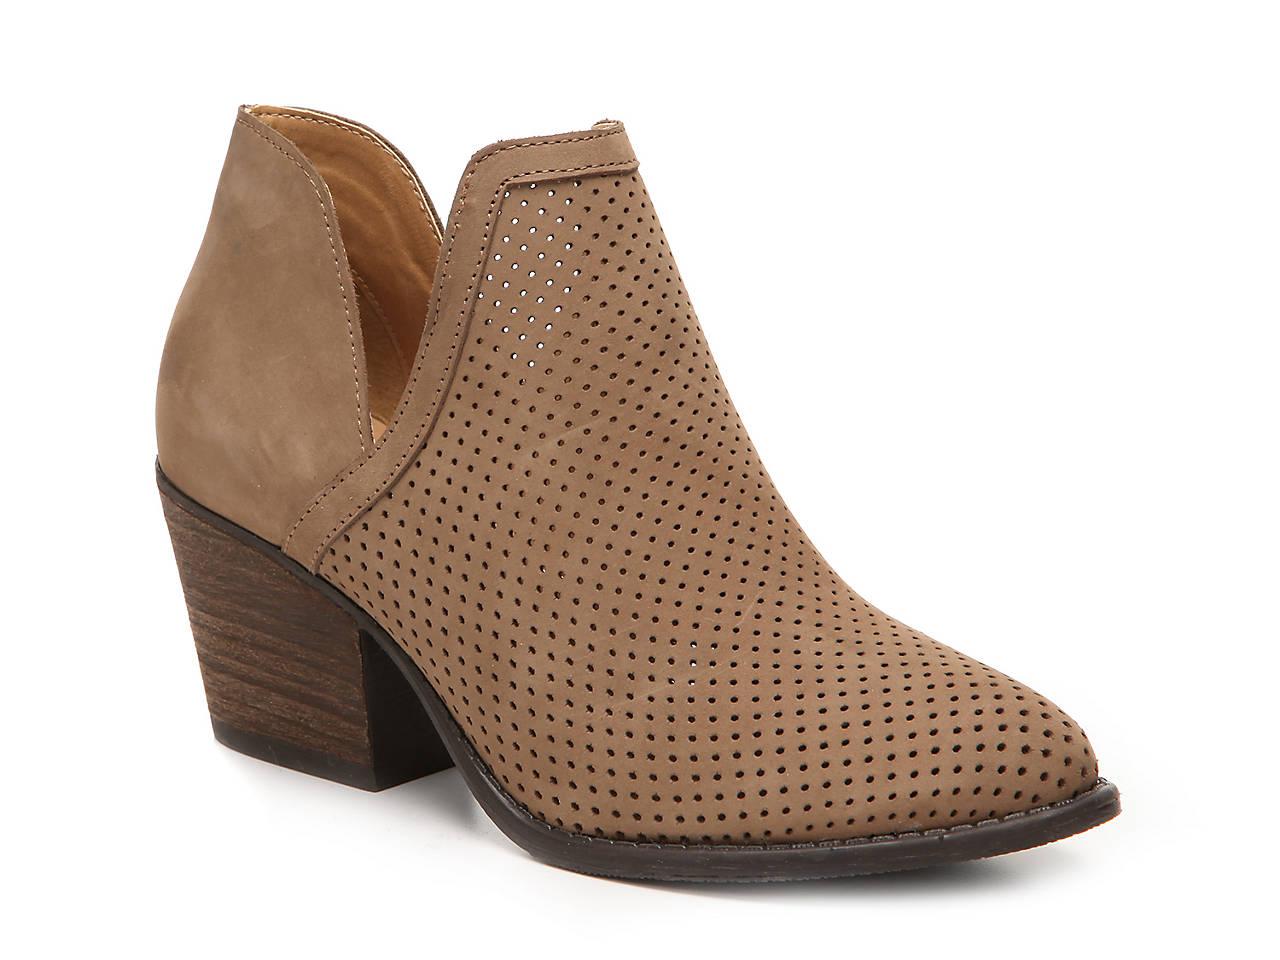 7db174cca70 Steve Madden Amerisa Bootie Women s Shoes